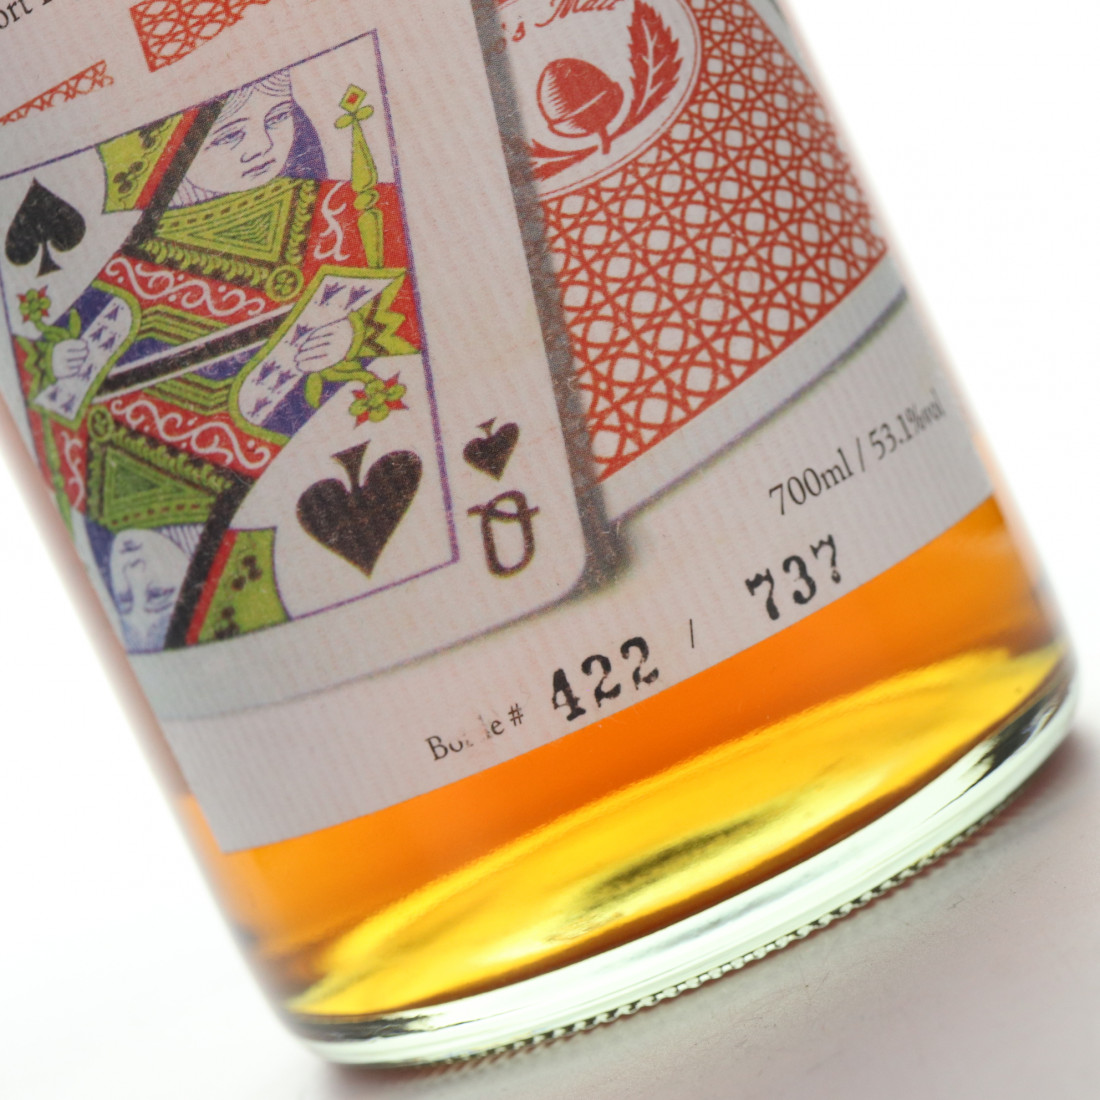 Hanyu 1990 Ichiro's Malt 'Card' #466 / Queen of Spades